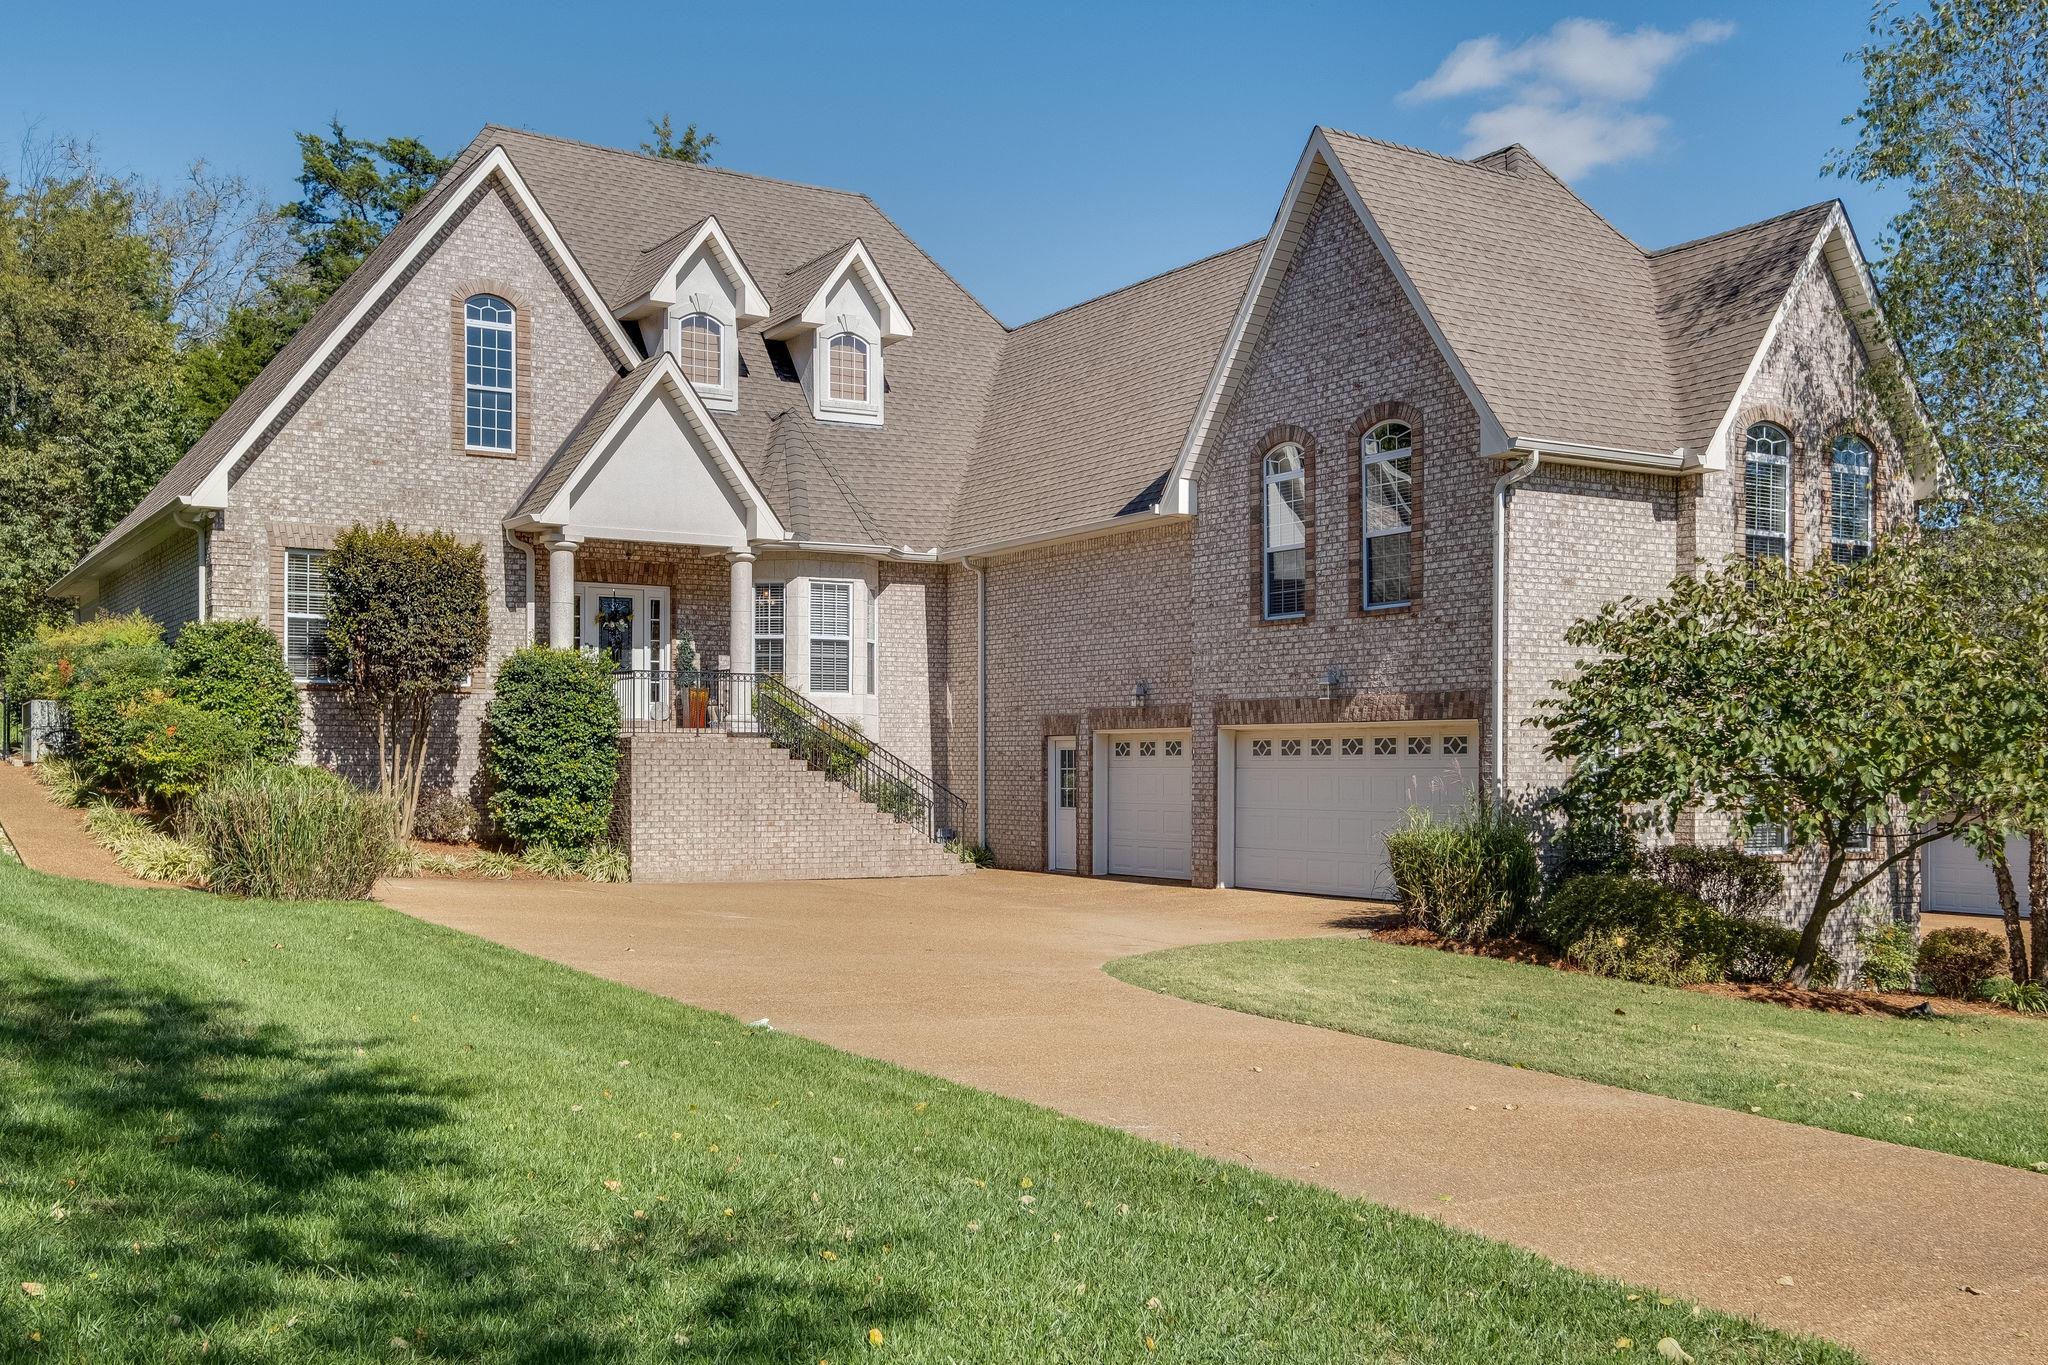 1043 Island Brook Dr, Hendersonville, TN 37075 - Hendersonville, TN real estate listing